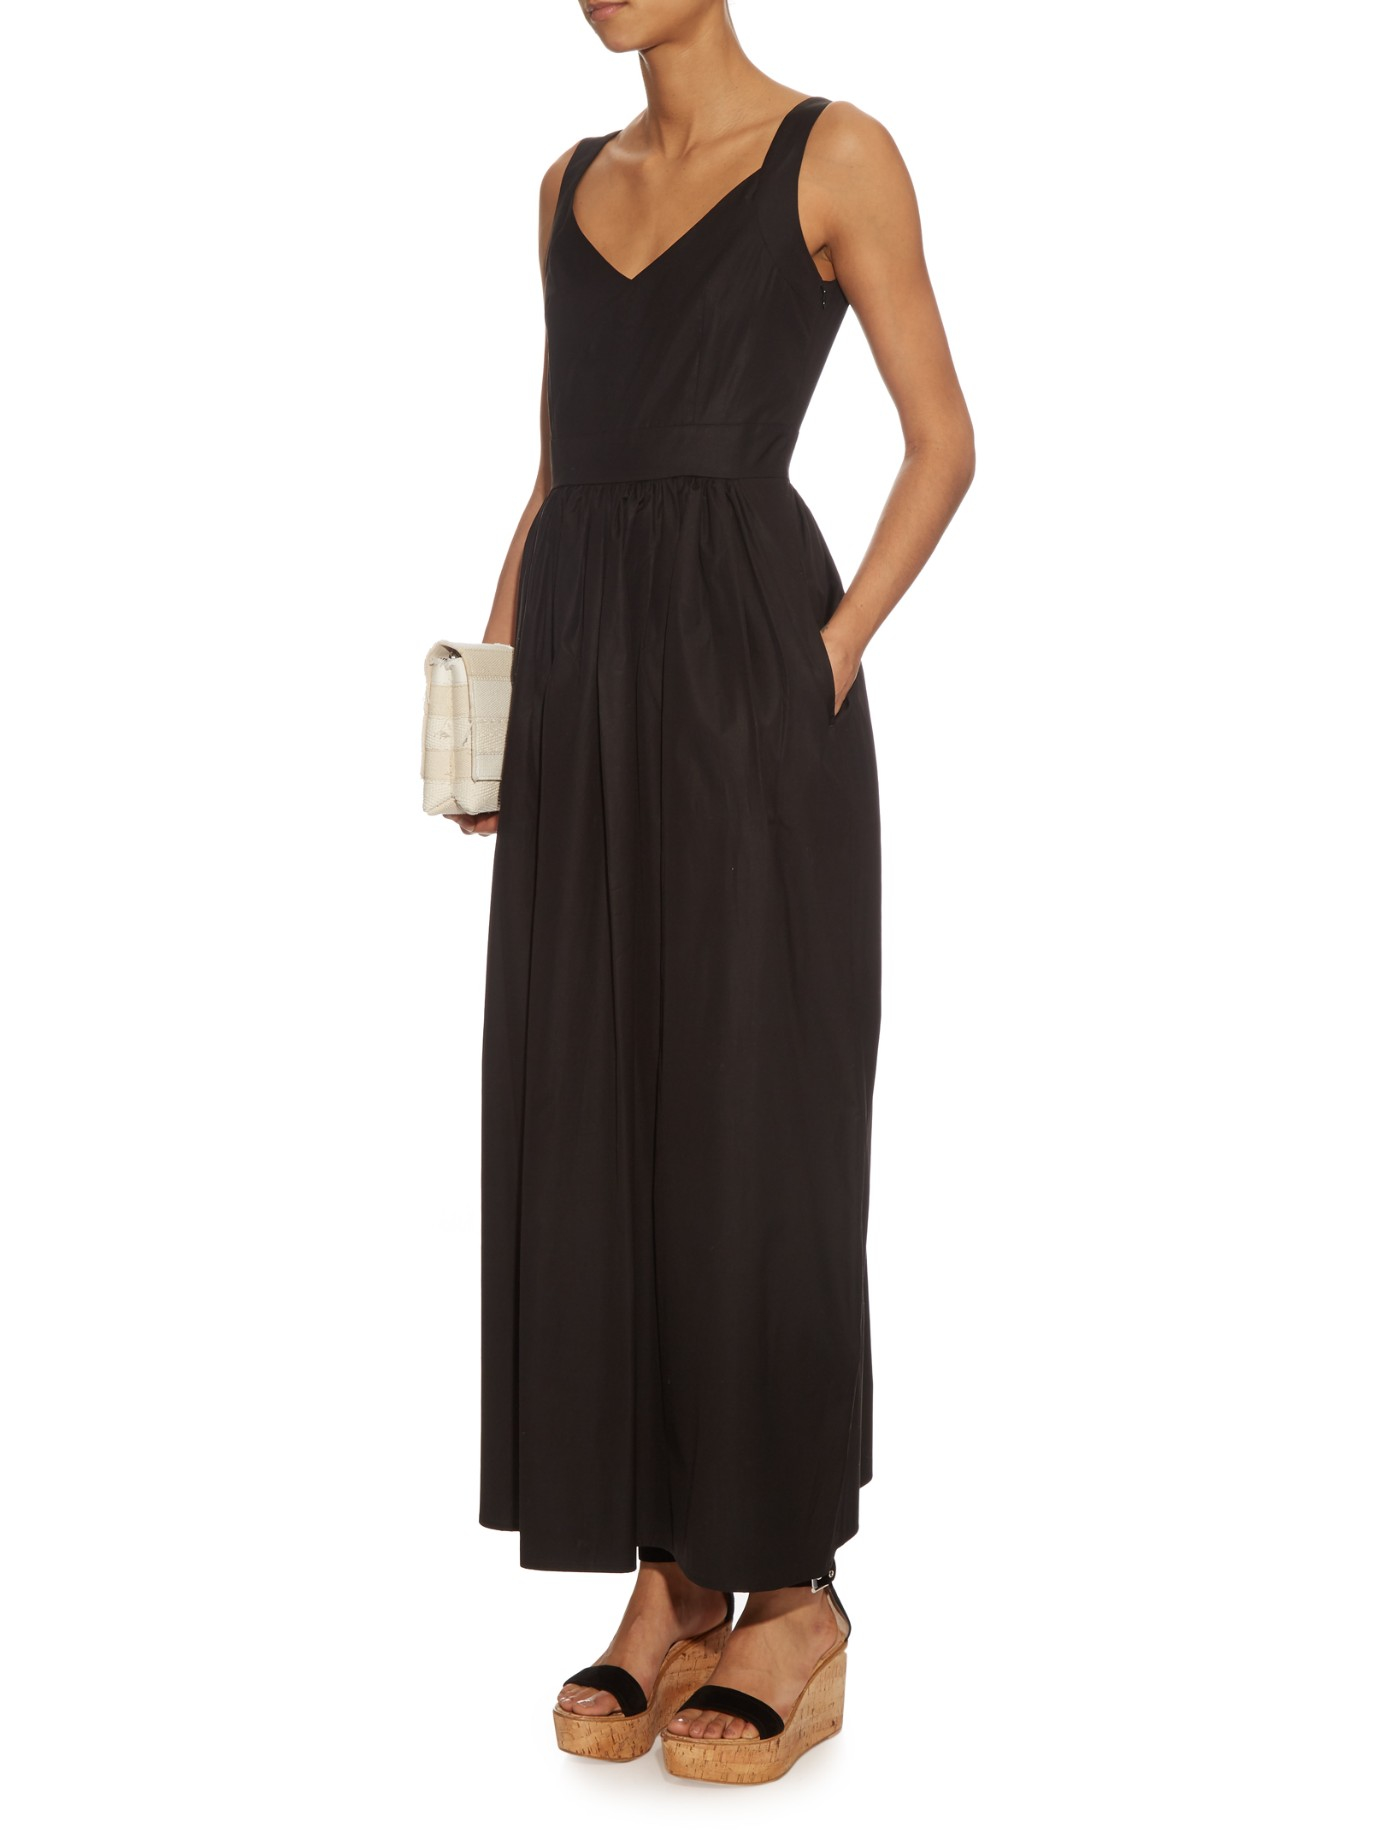 max mara studio rosa dress in black lyst. Black Bedroom Furniture Sets. Home Design Ideas